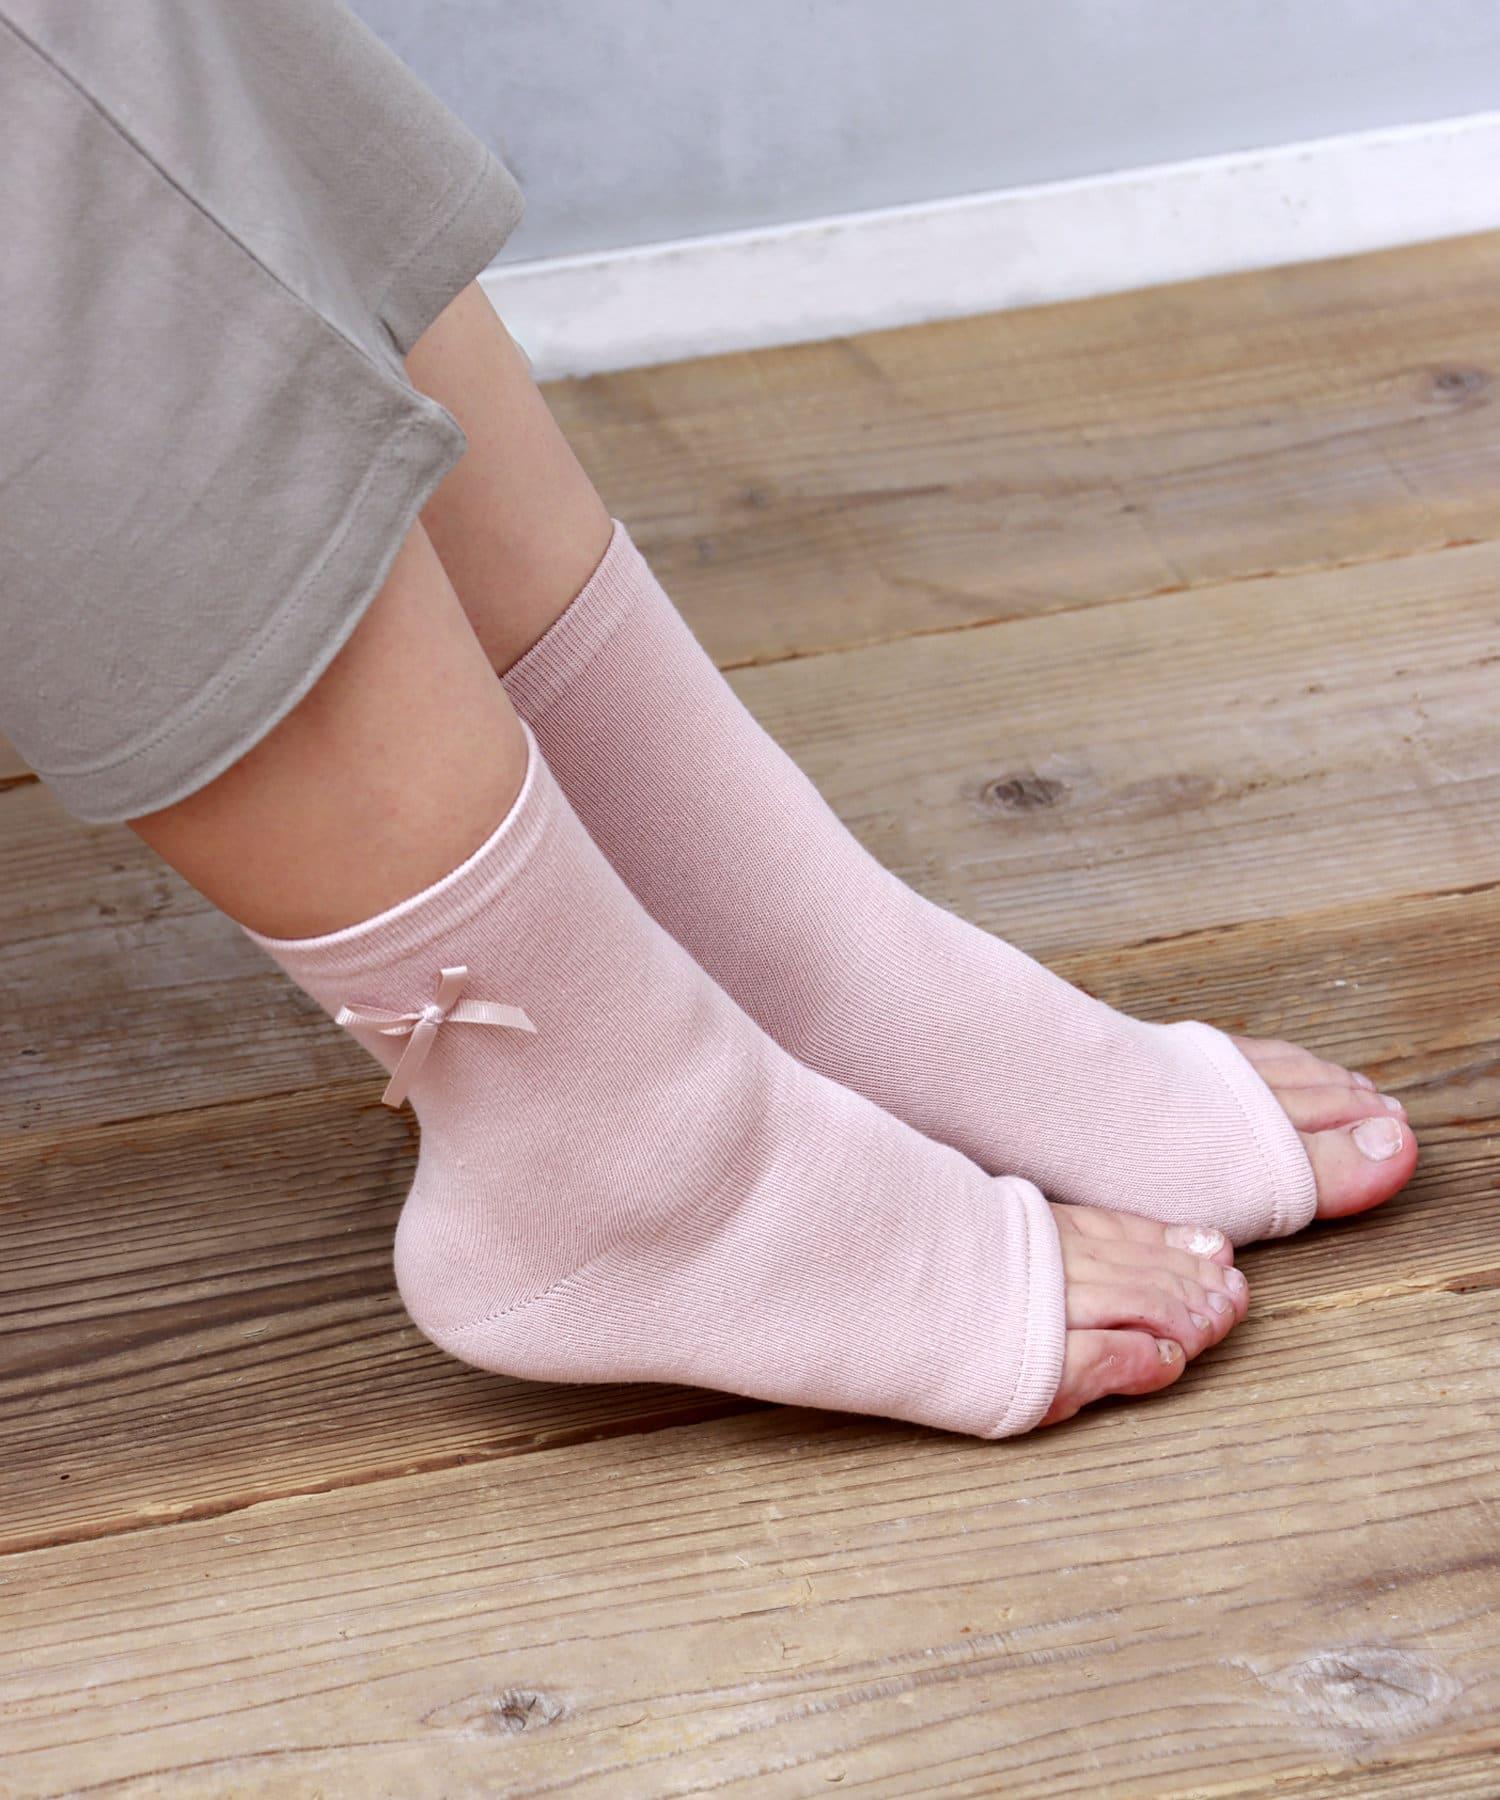 3COINS(スリーコインズ) ライフスタイル 【就寝時の集中肌ケア】かかと保湿用ソックス ピンク